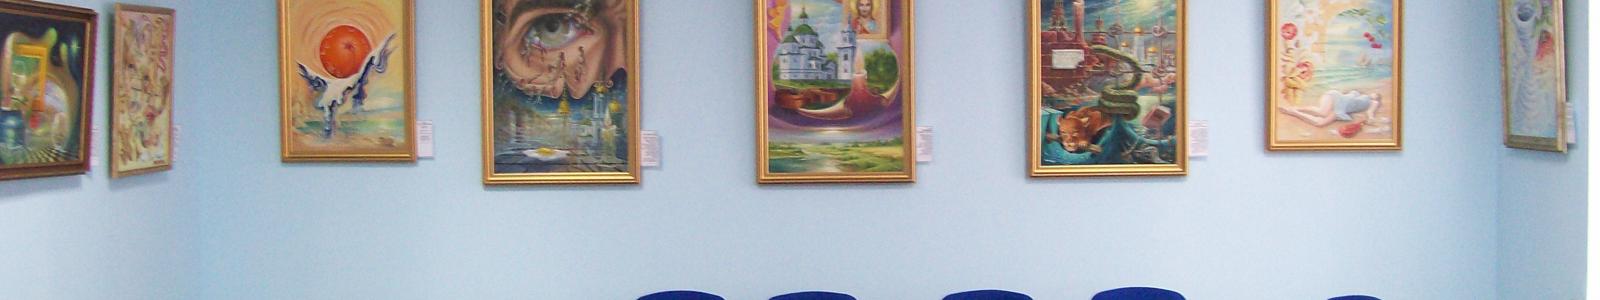 Gallery Painter viktor shutka